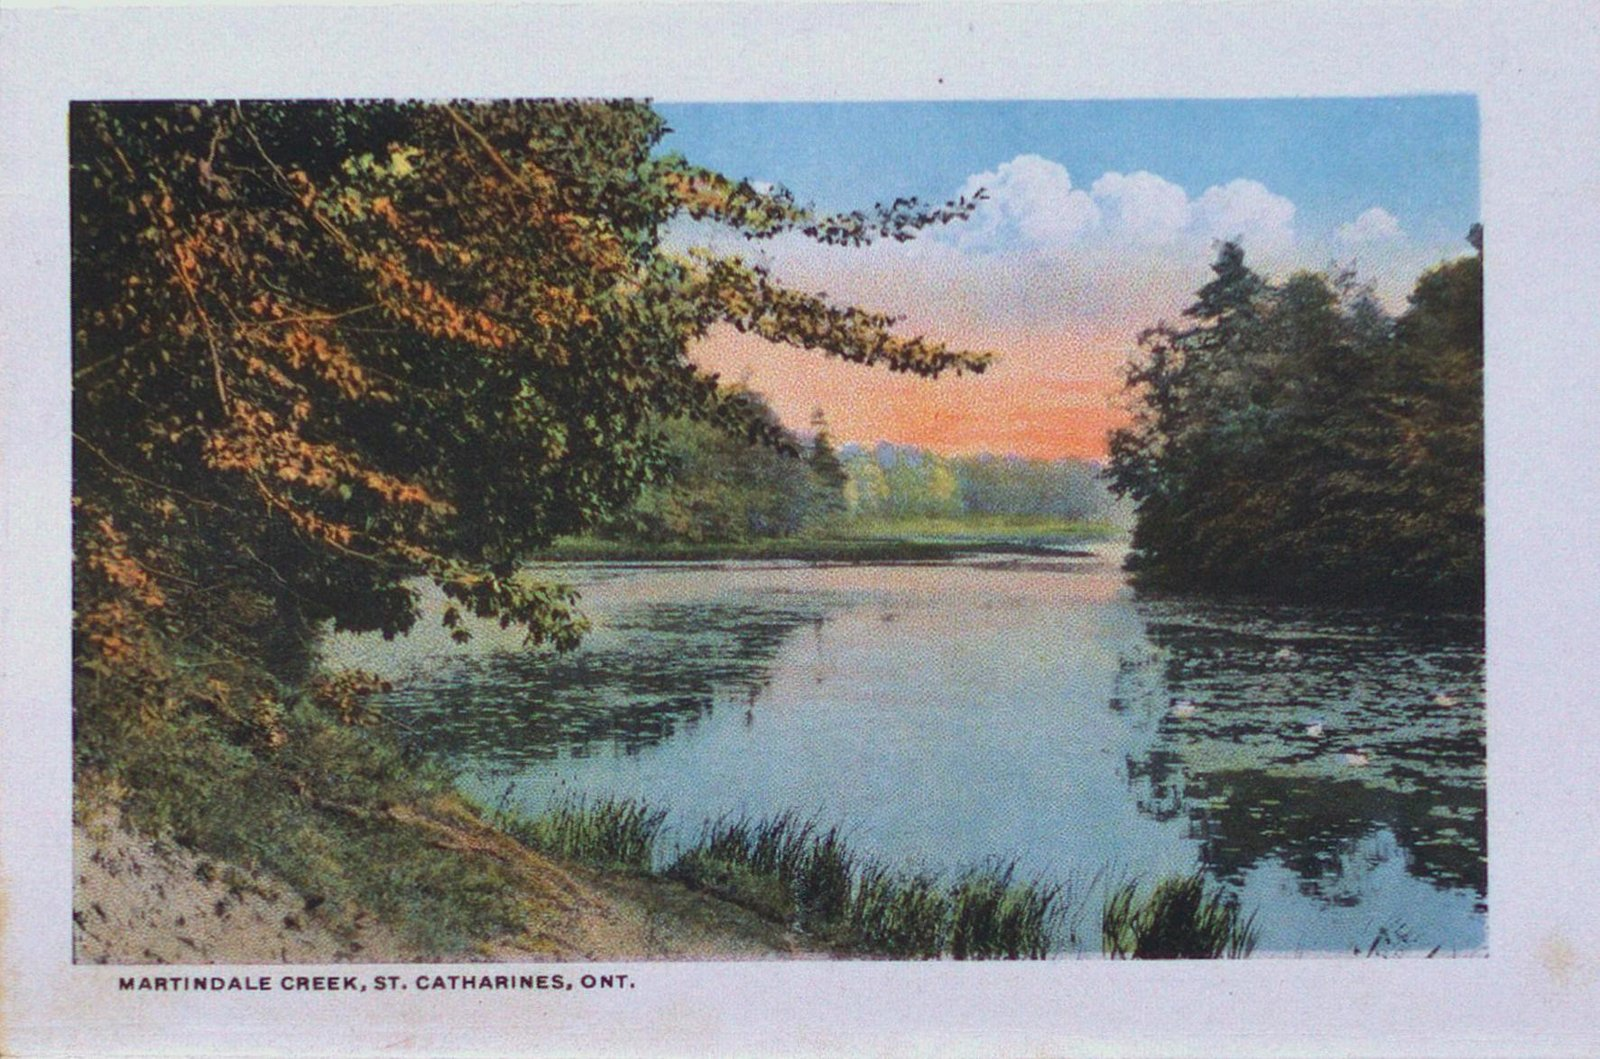 Souvenir Folder of St. Catharines: Martindale Creek